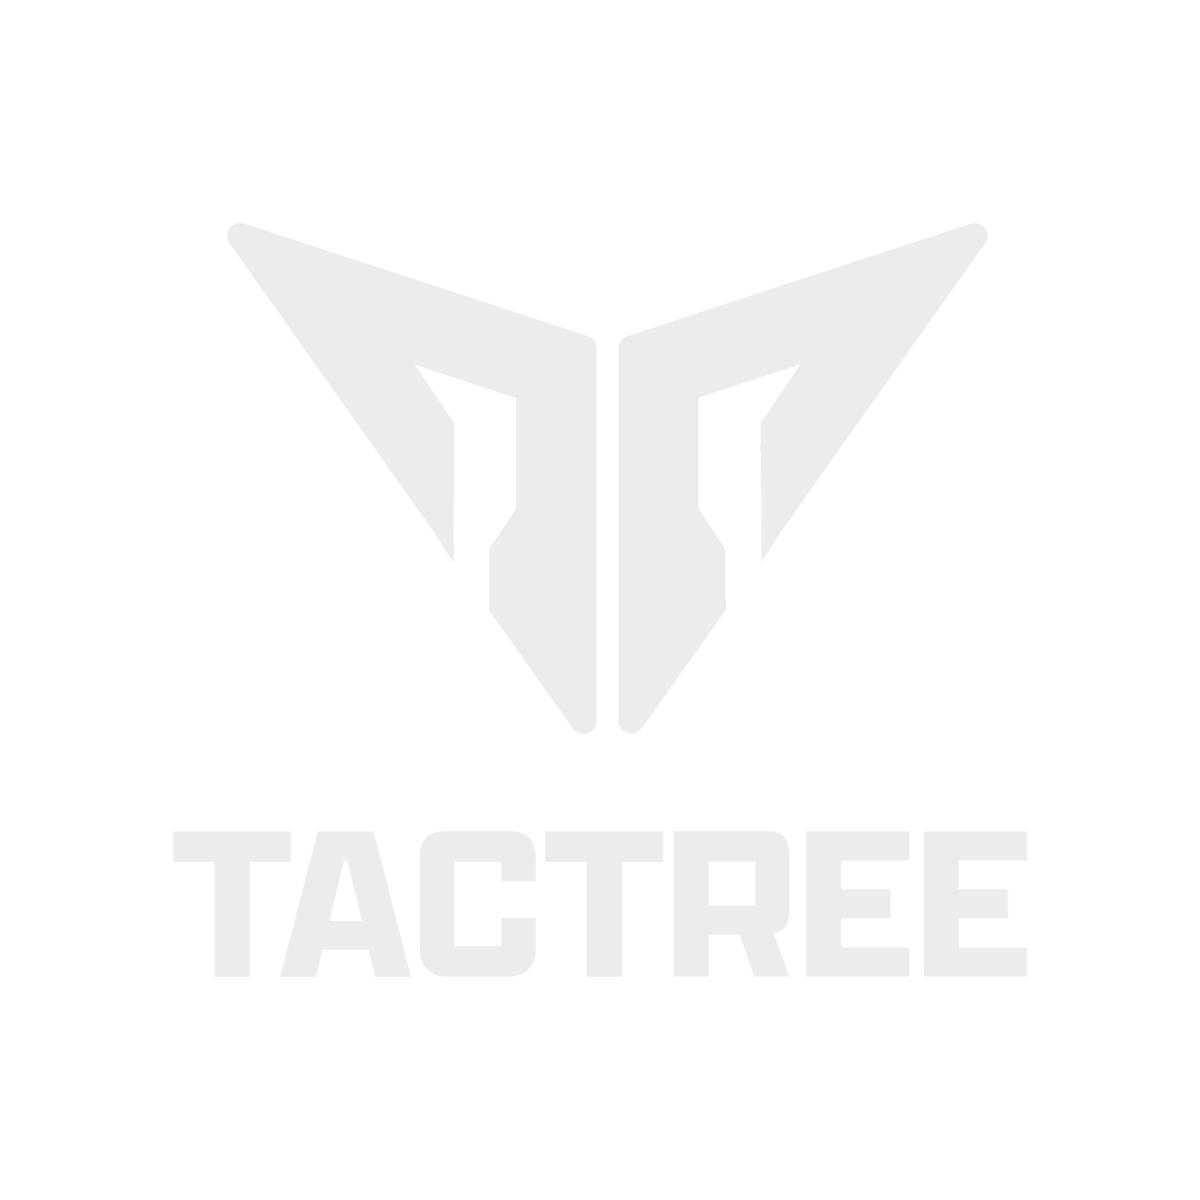 Bates Tactical Performance Socks (Crew)